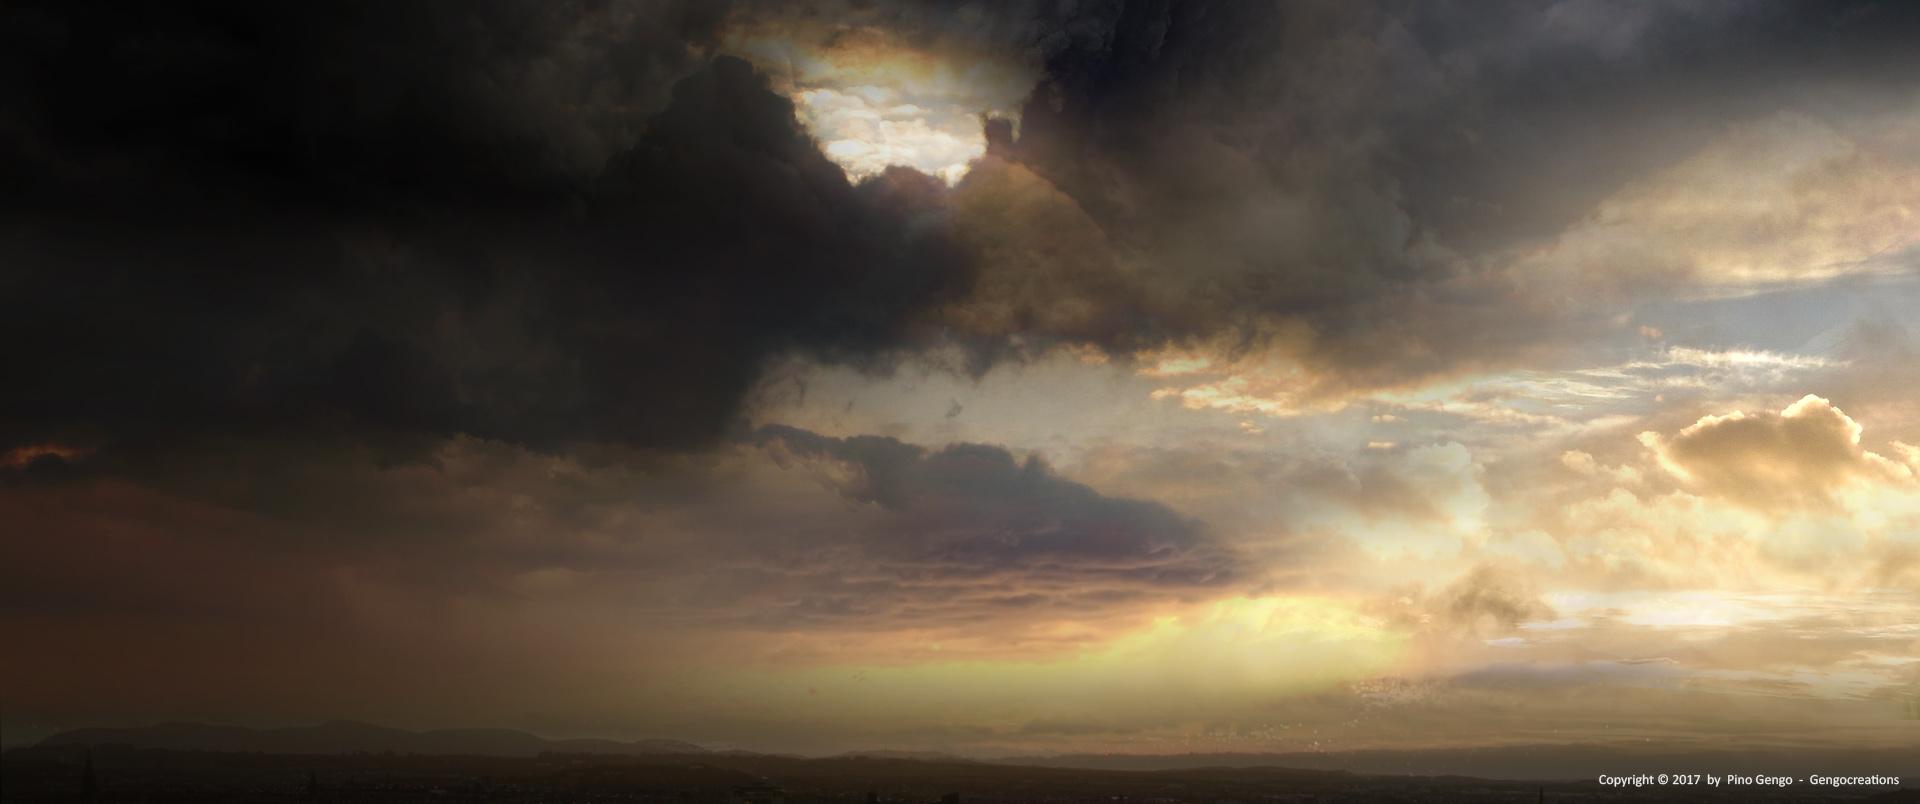 Pino Gengo: Sunset - Matte Painting